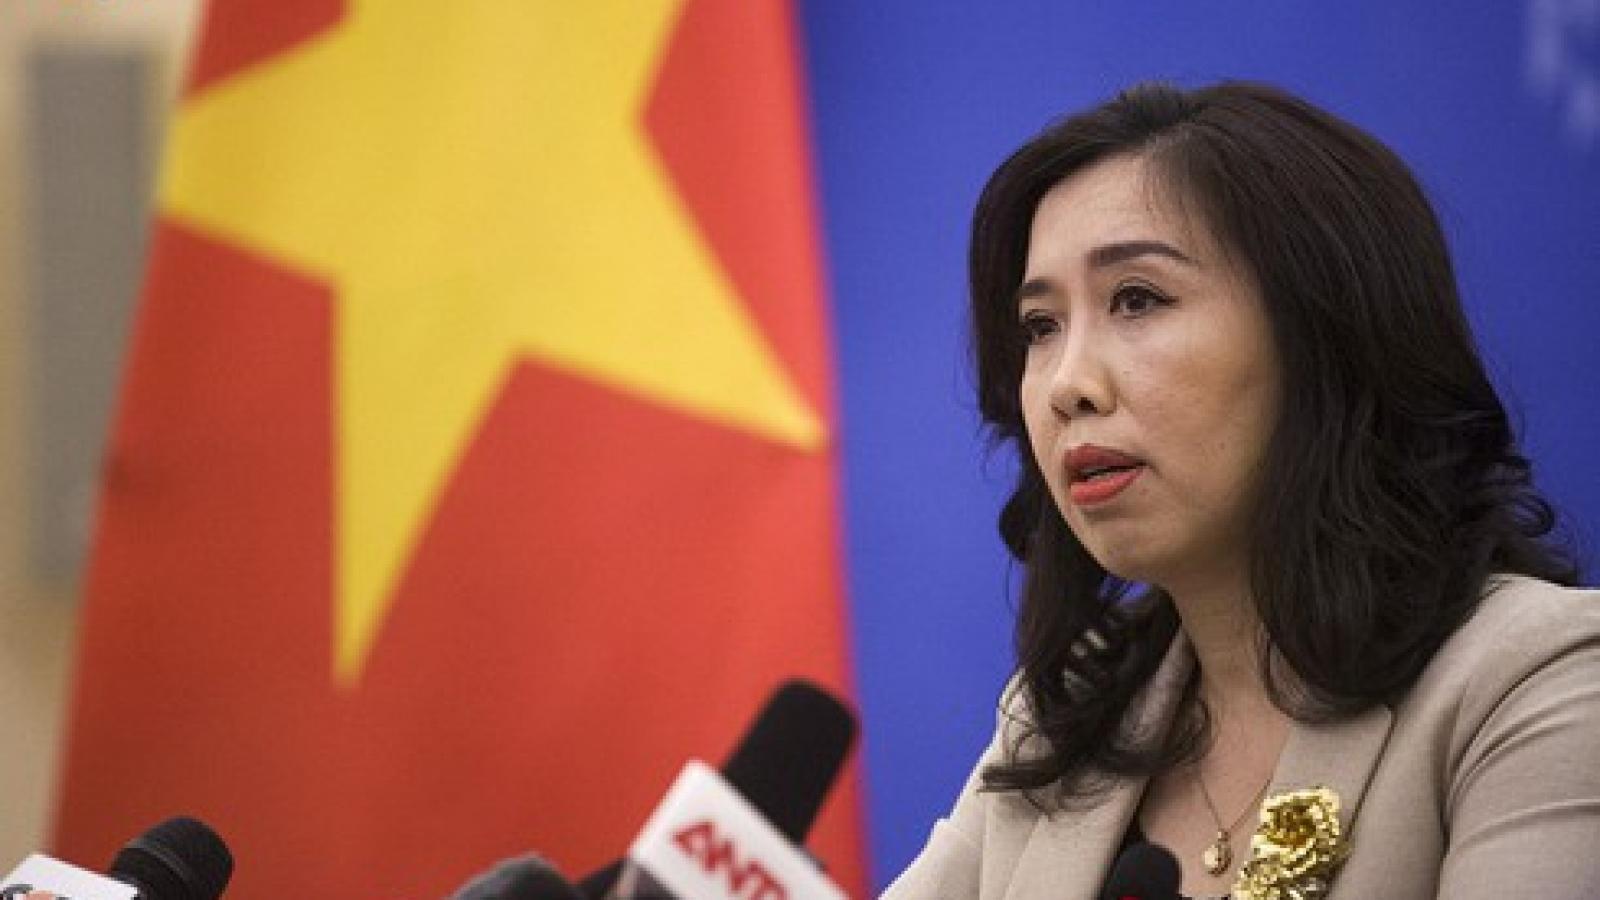 Strong objection to Chinese activities in Hoang Sa and Truong Sa